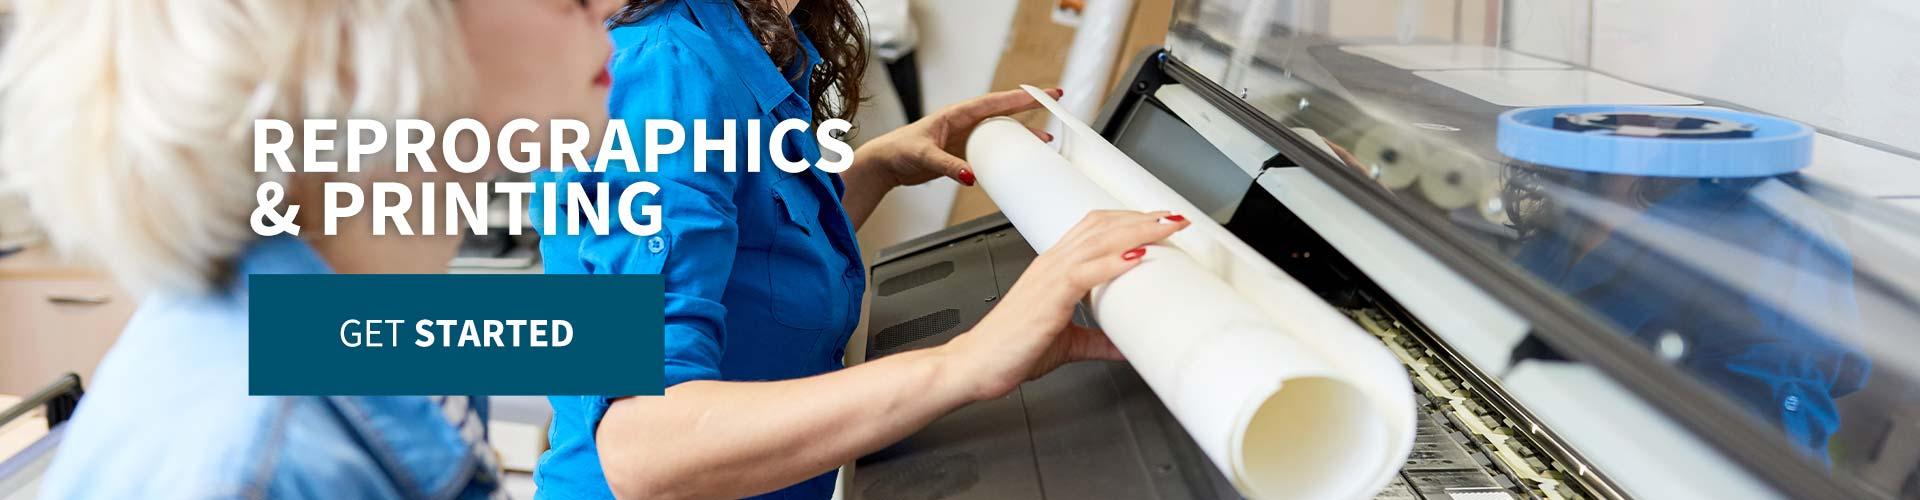 Reprographics & Printing